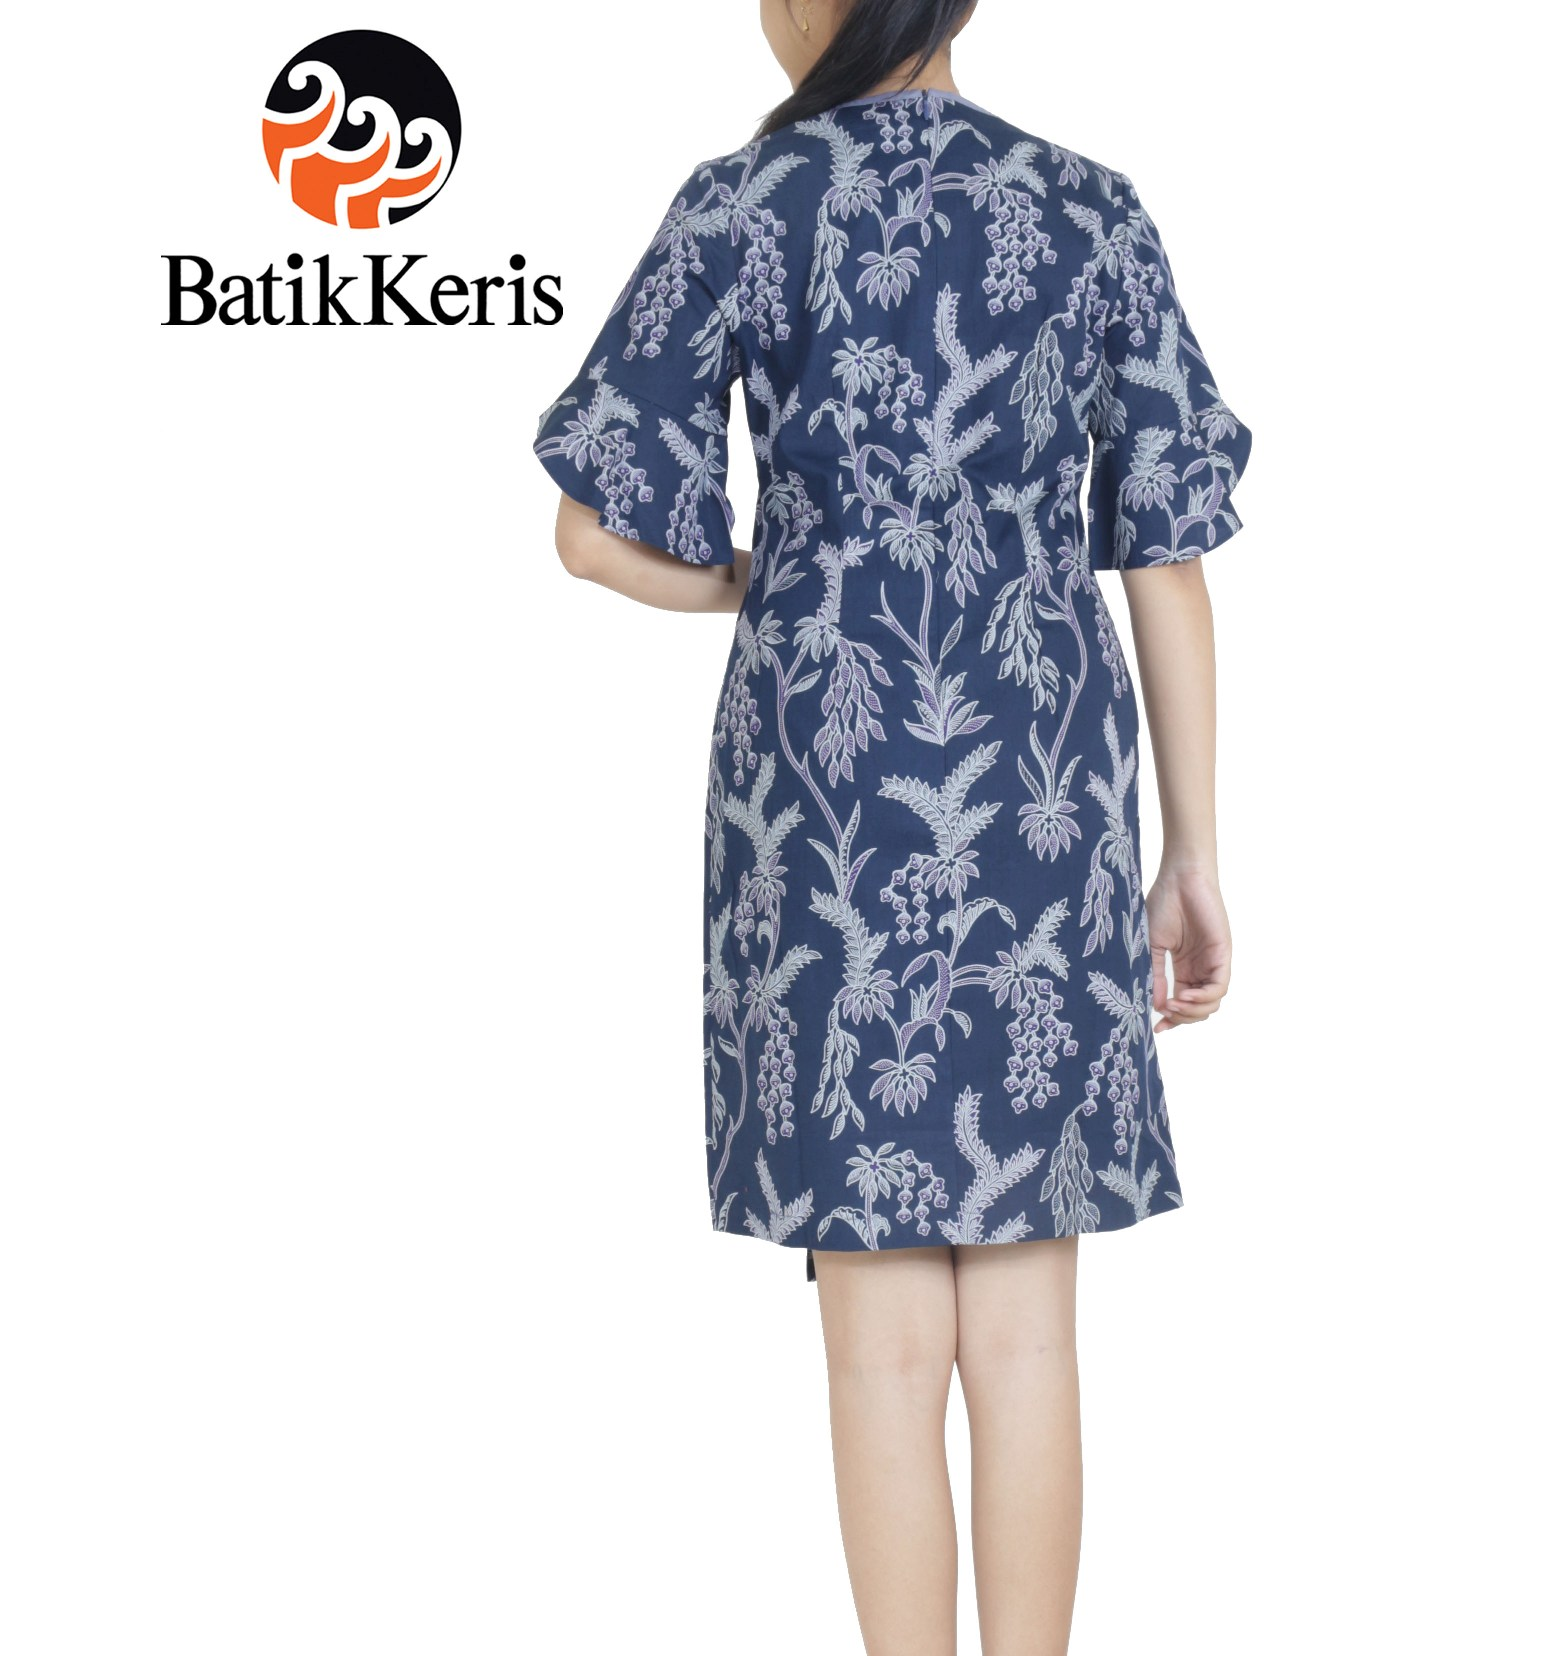 Batik Keris Online » SACKDRESS BATIK MOTIF PUSPO SUMULUR df999ea43e